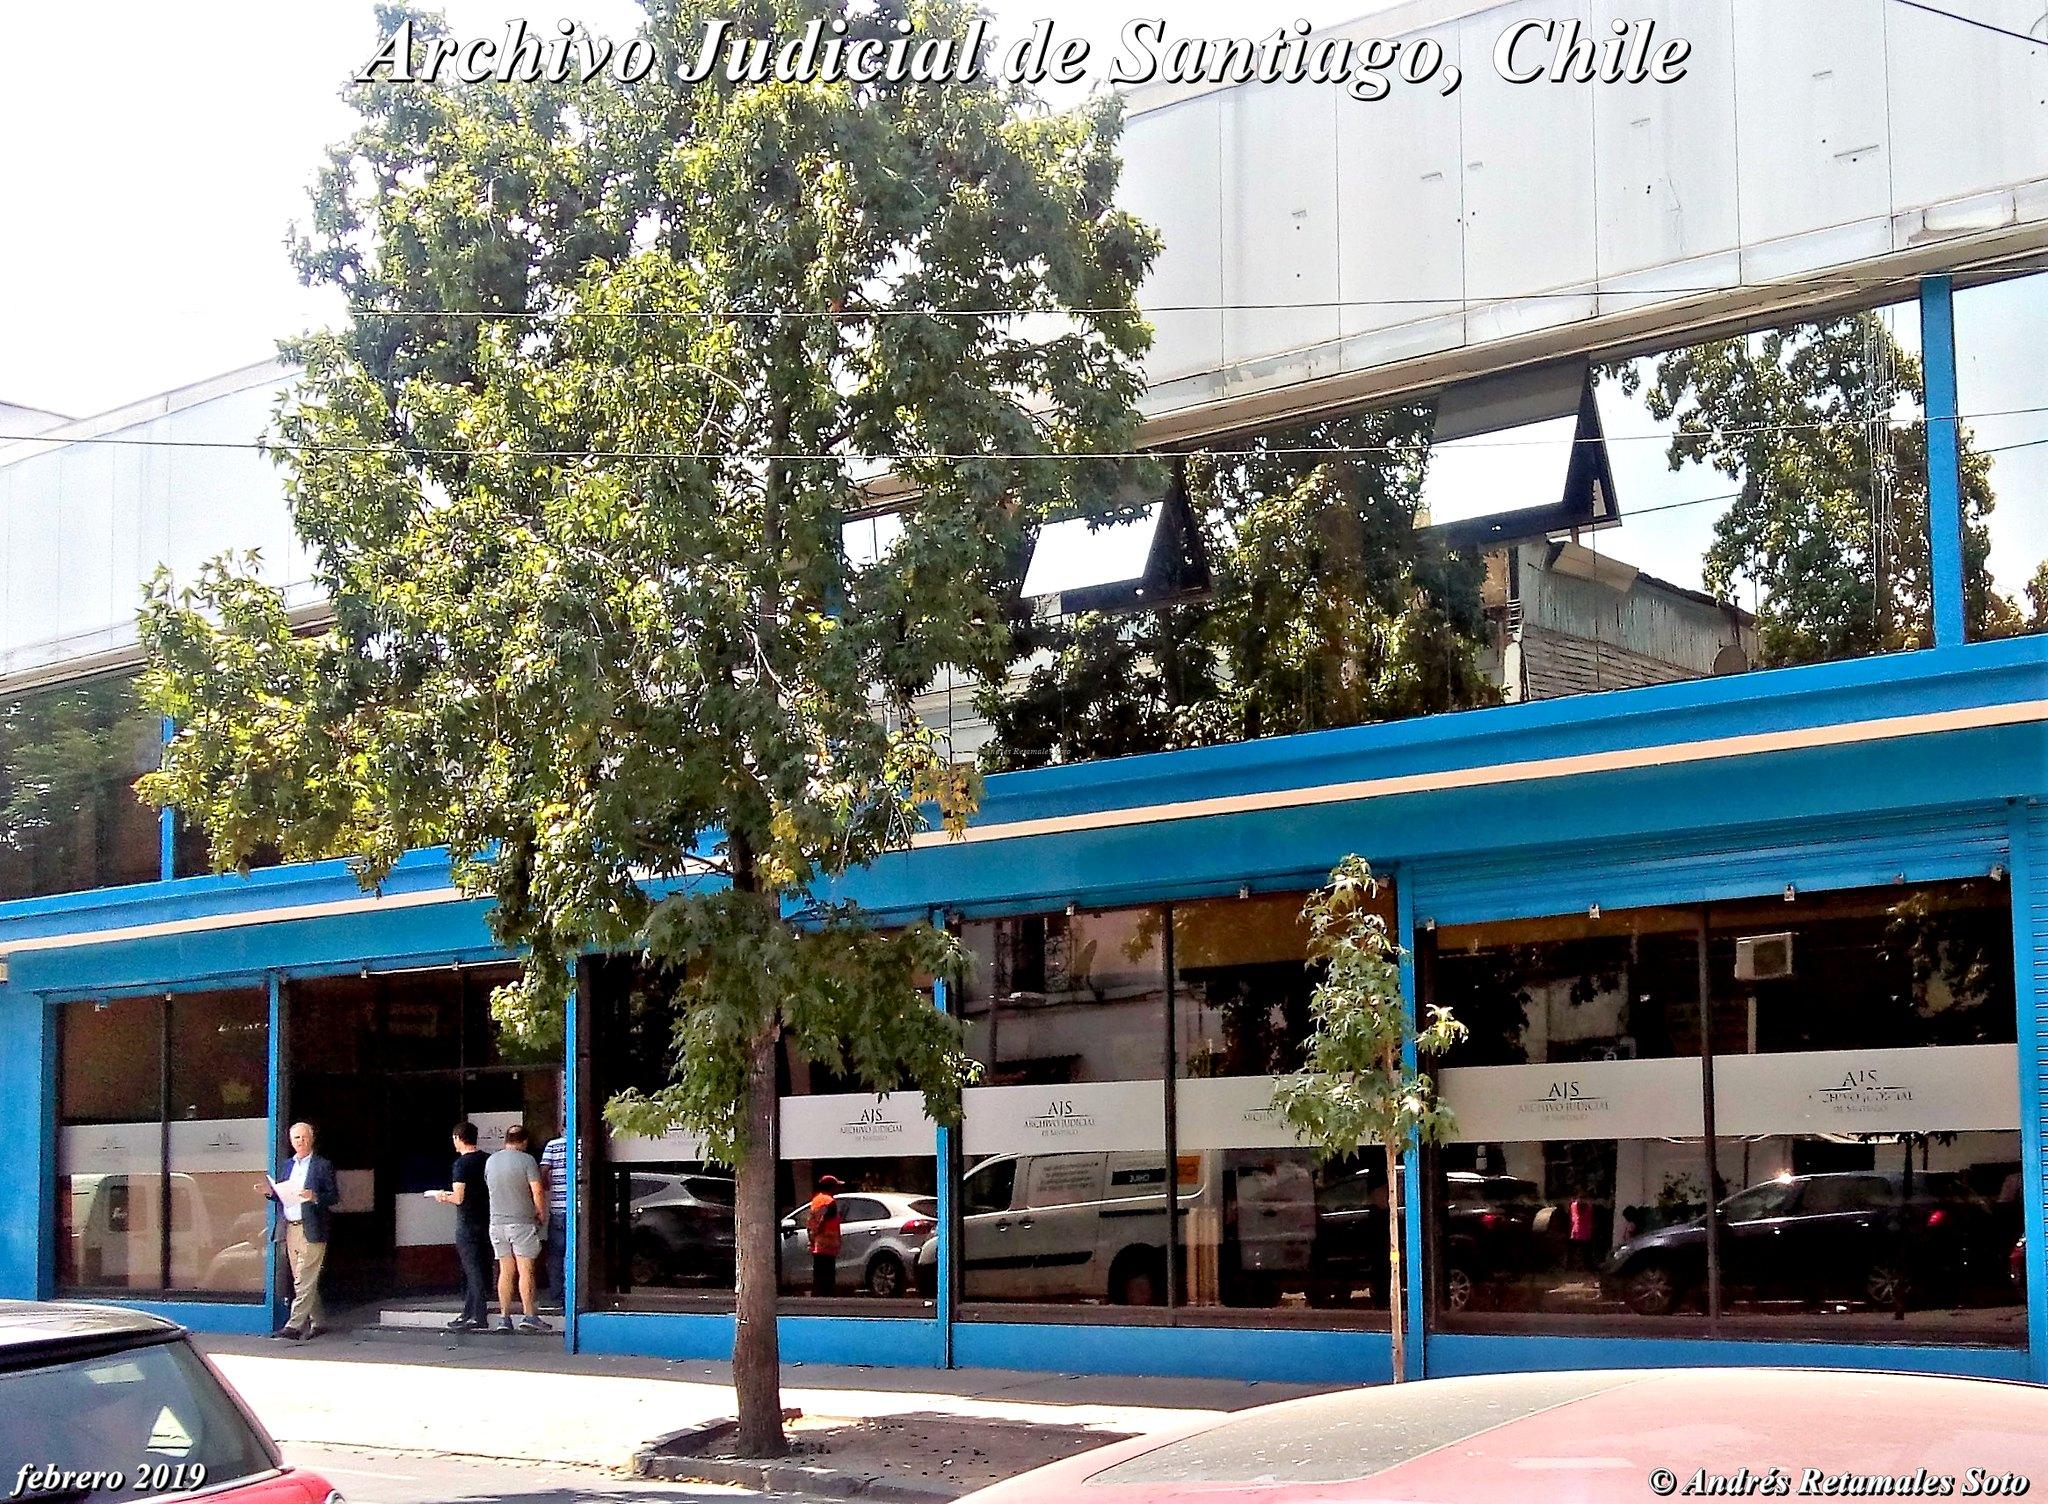 Archivo Judicial de Santiago, Chile, febrero 2019. ⚖️🆑 Andrés Retamales - copia